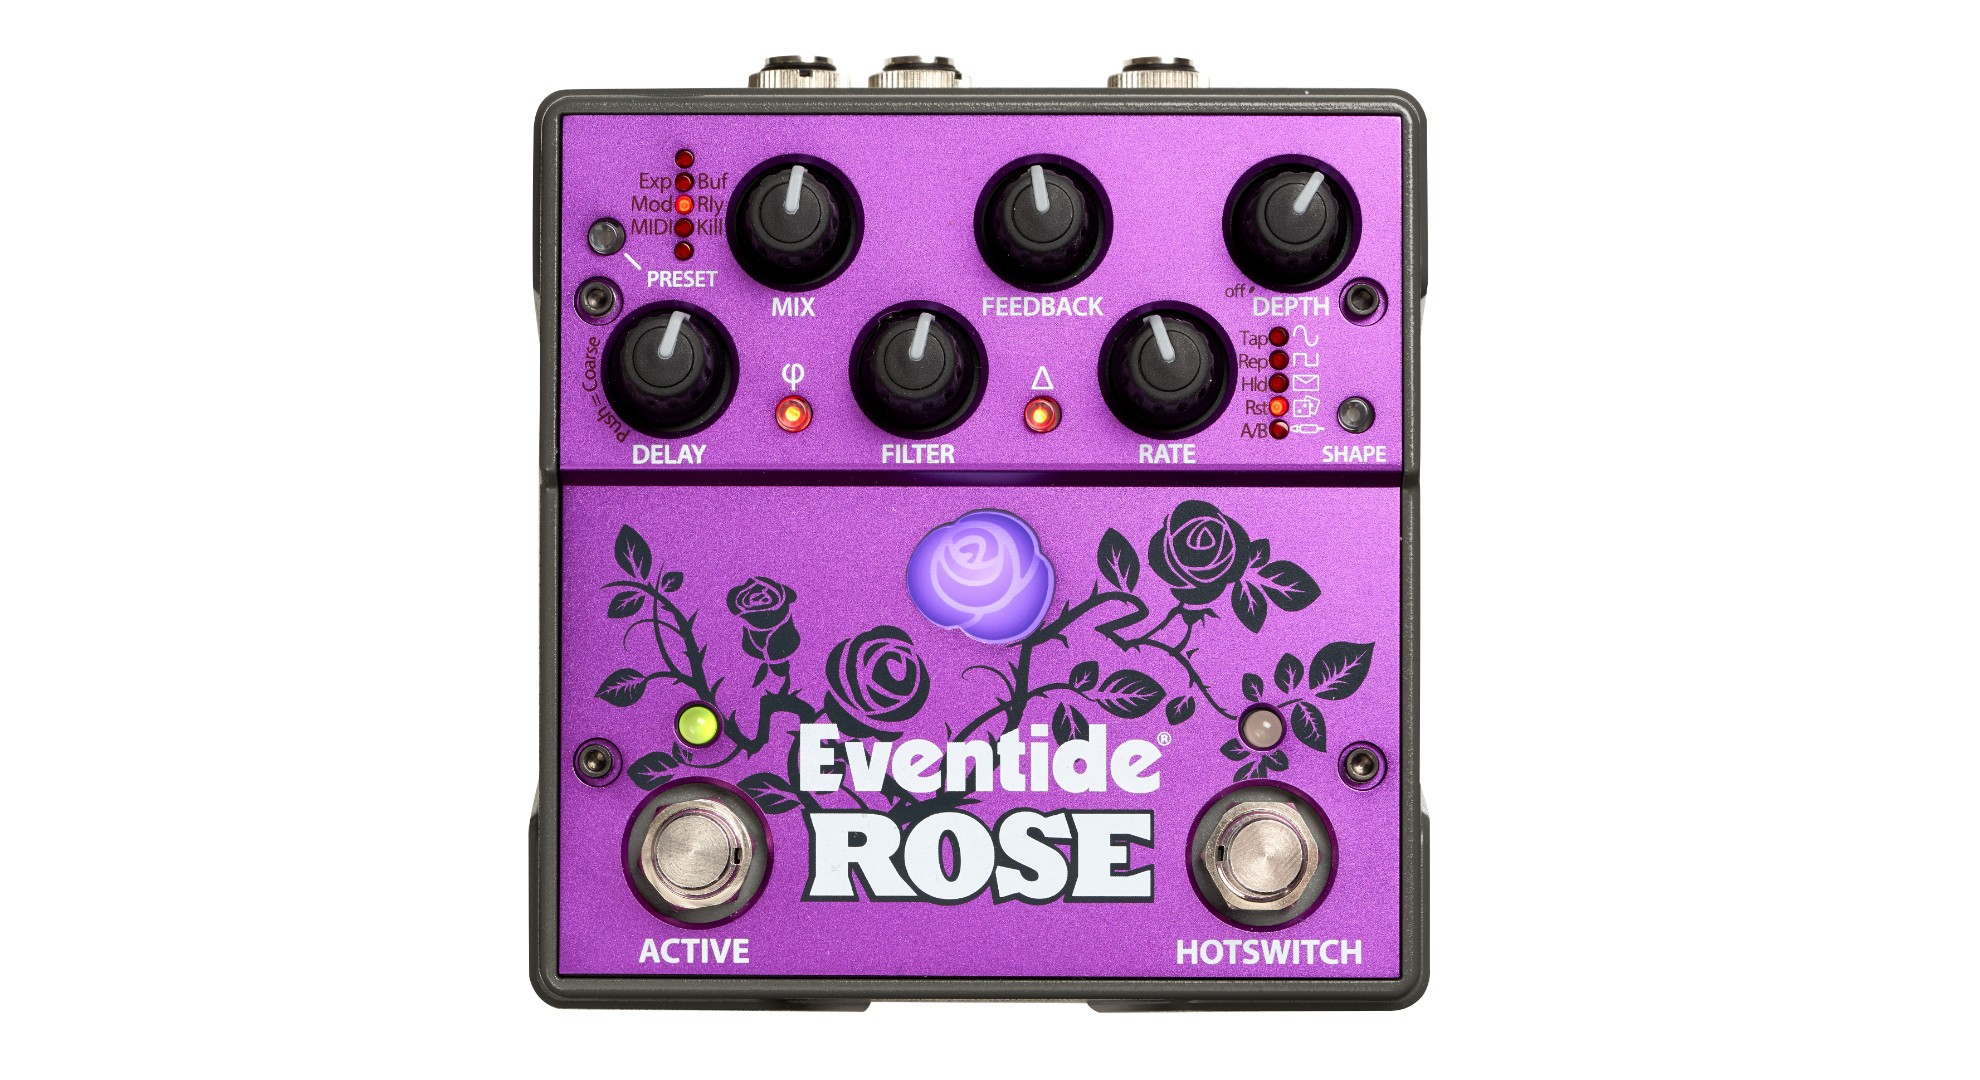 Eventide Rose Top.jpg